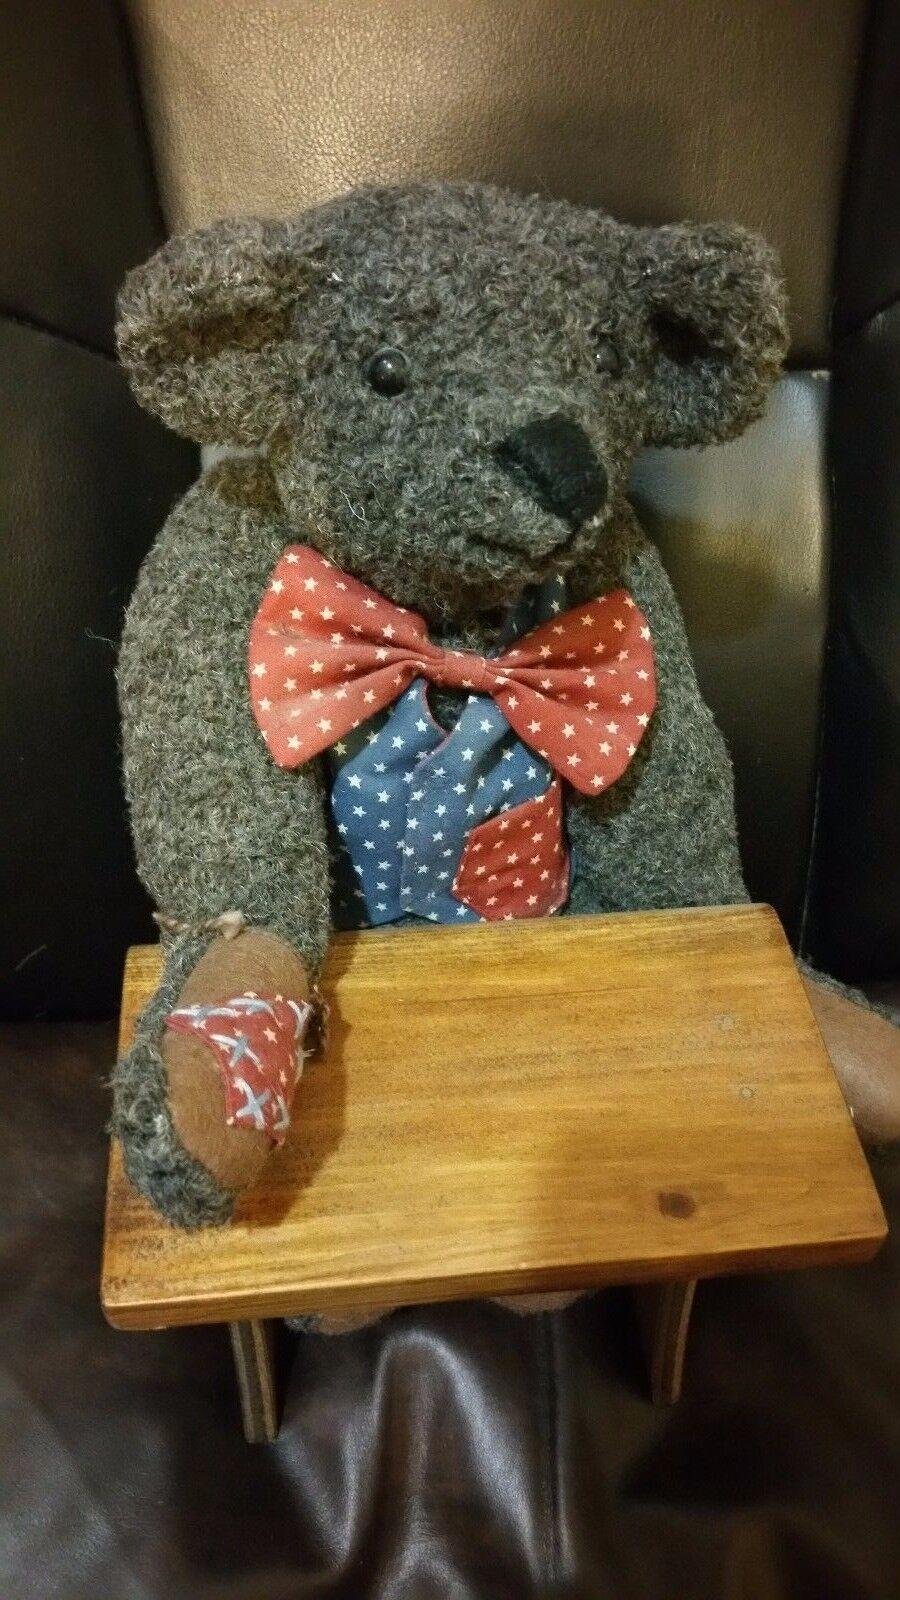 Theadore B. Bear  12  Bear LMT 766/5000 House of Nisbet Merrythought England